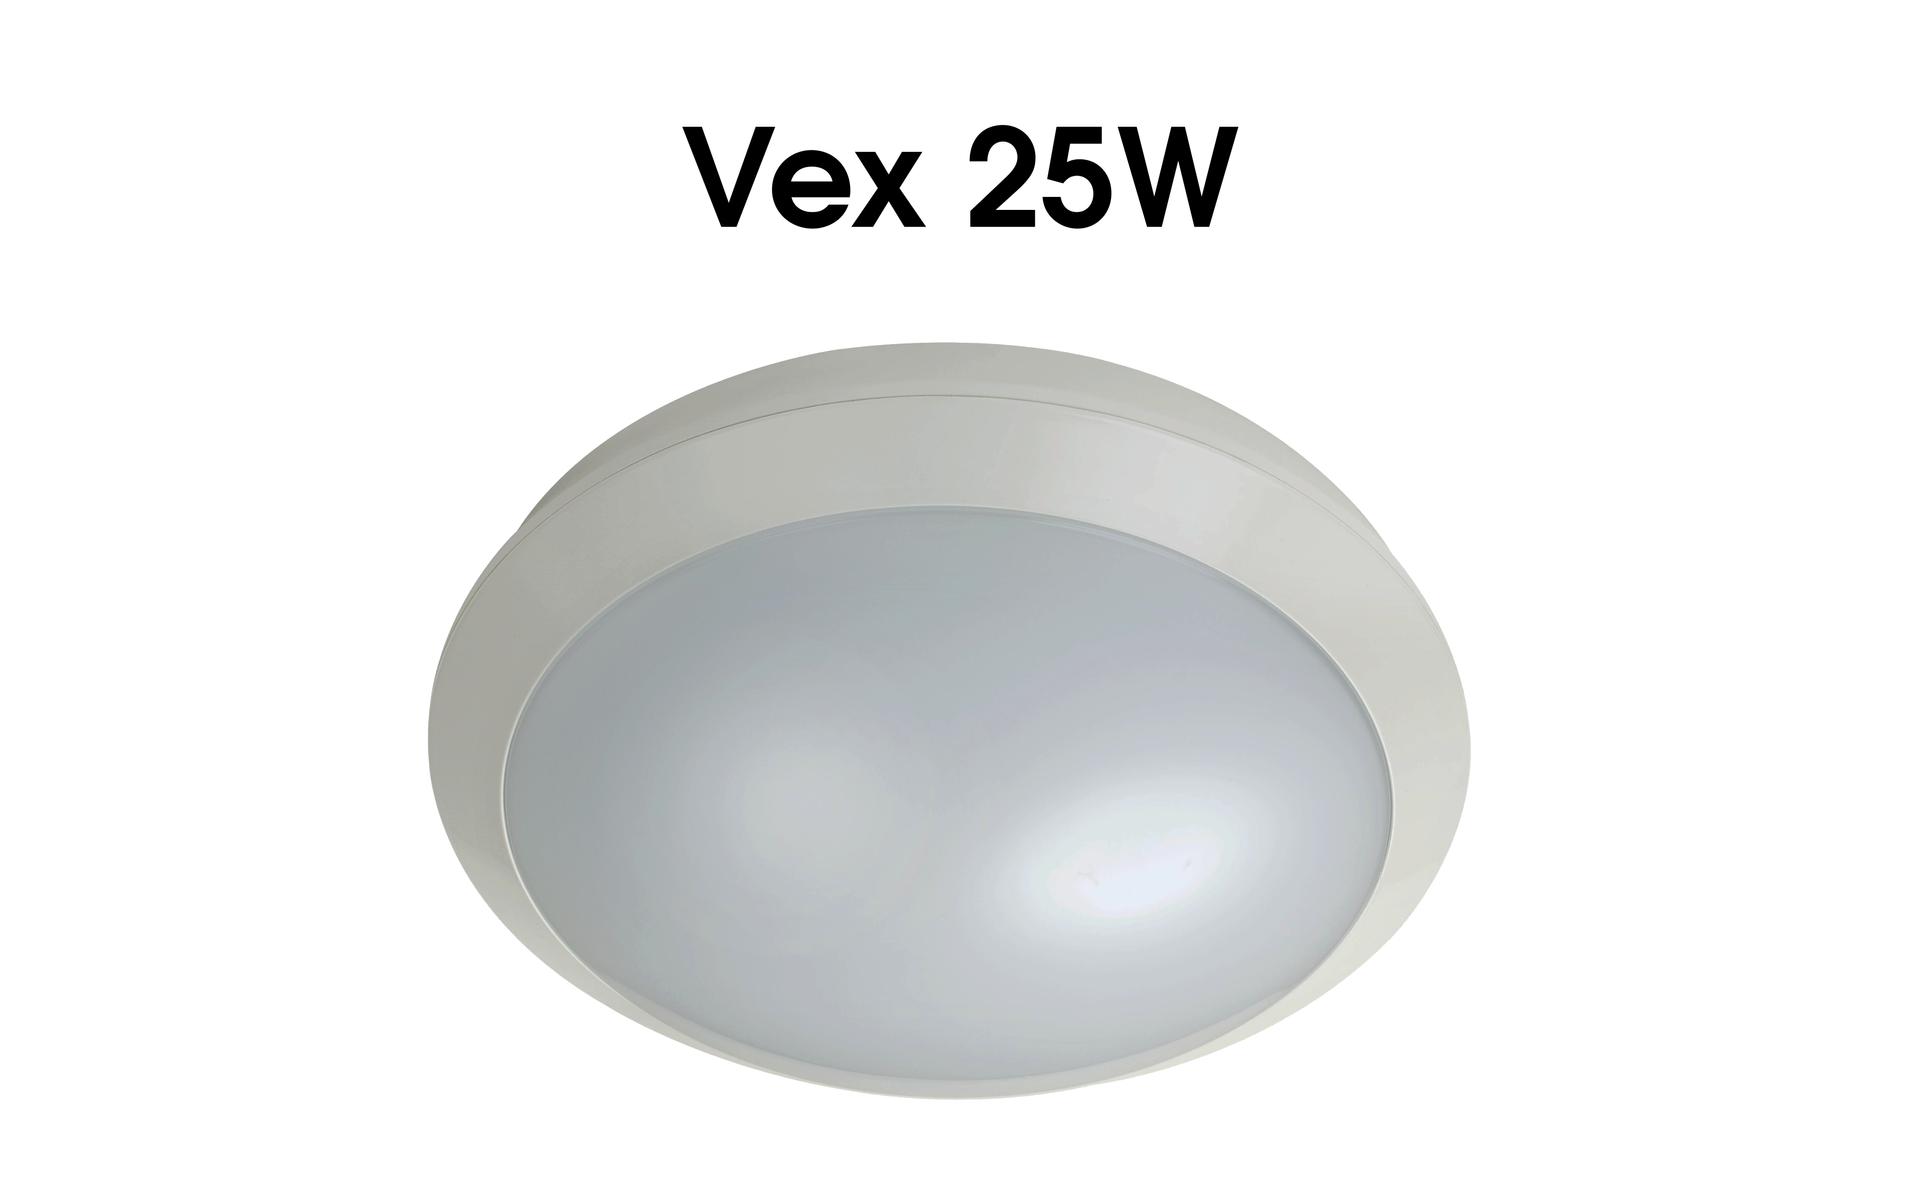 Vex Standard 420 Mobile-01.png